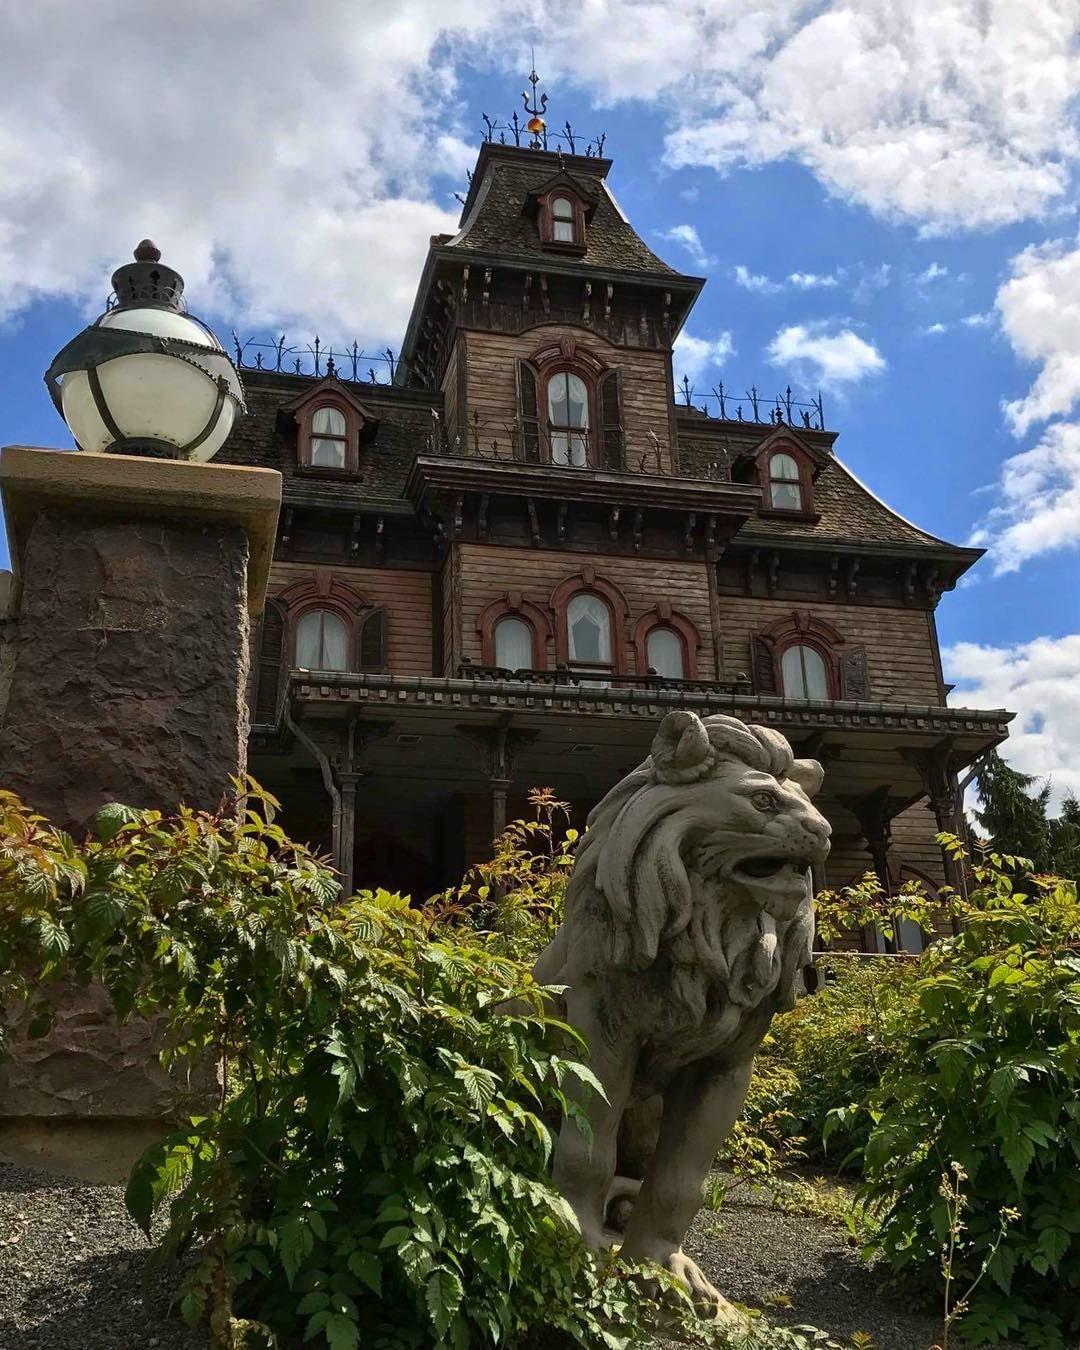 Phantom Manor Haunted House In Frontierland Disneyland